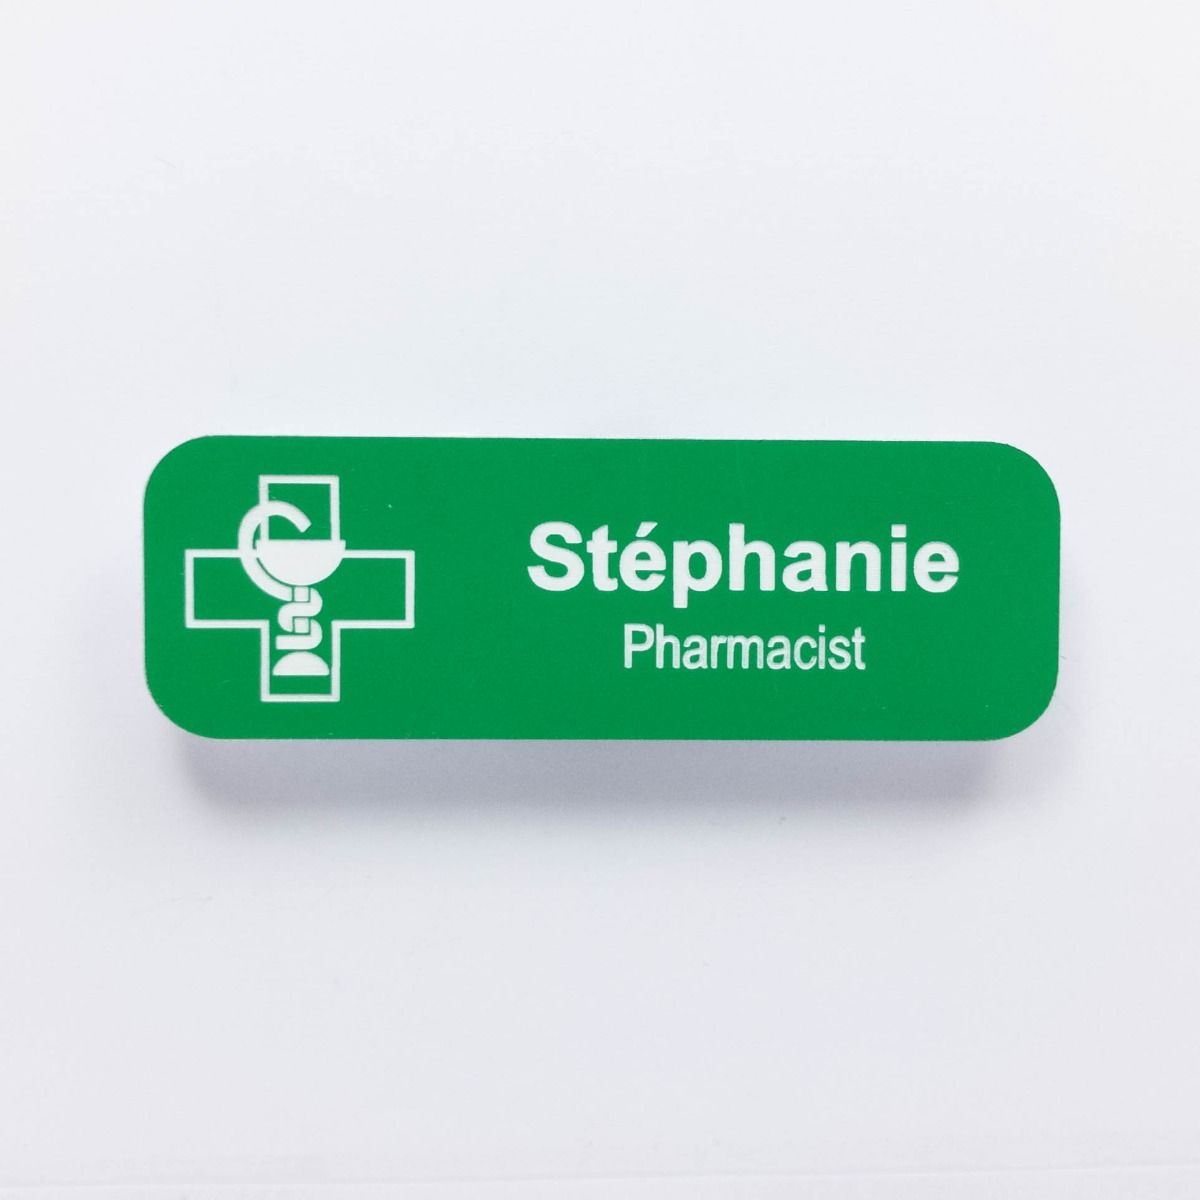 name_tag_pharmacien_-_plastique_grav_-_ordre_des_pharmaciens_du_qu_bec_-_inspiration_165.2_1